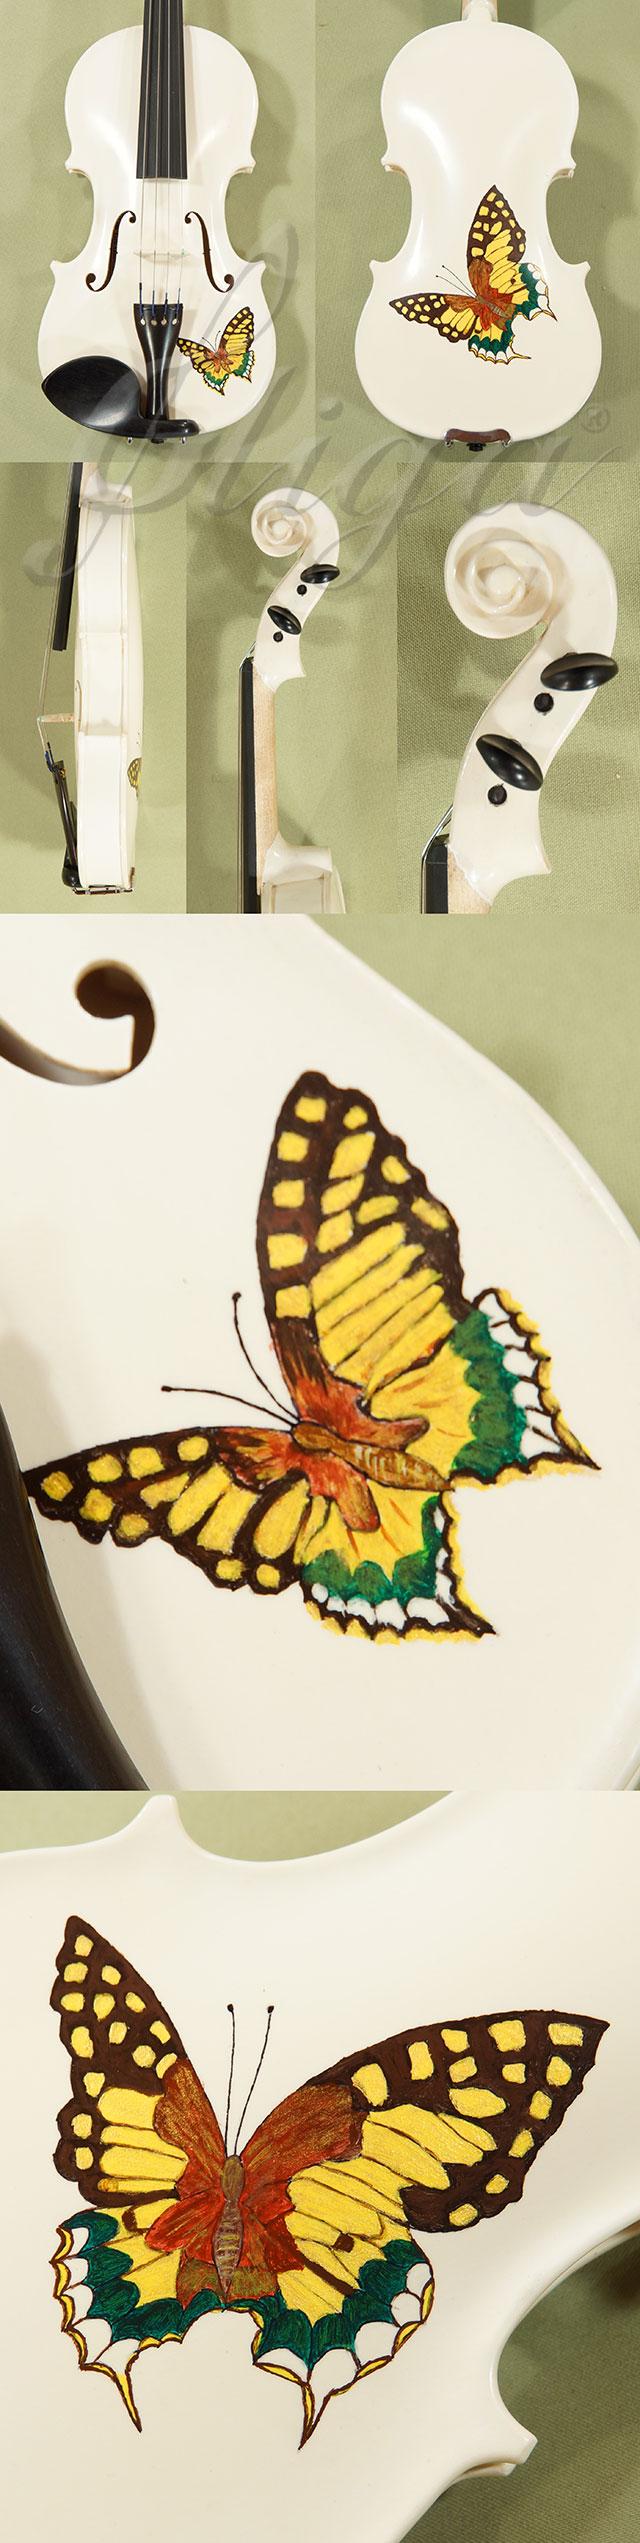 1/4 Student 'GEMS 2' White Butterflies Violin